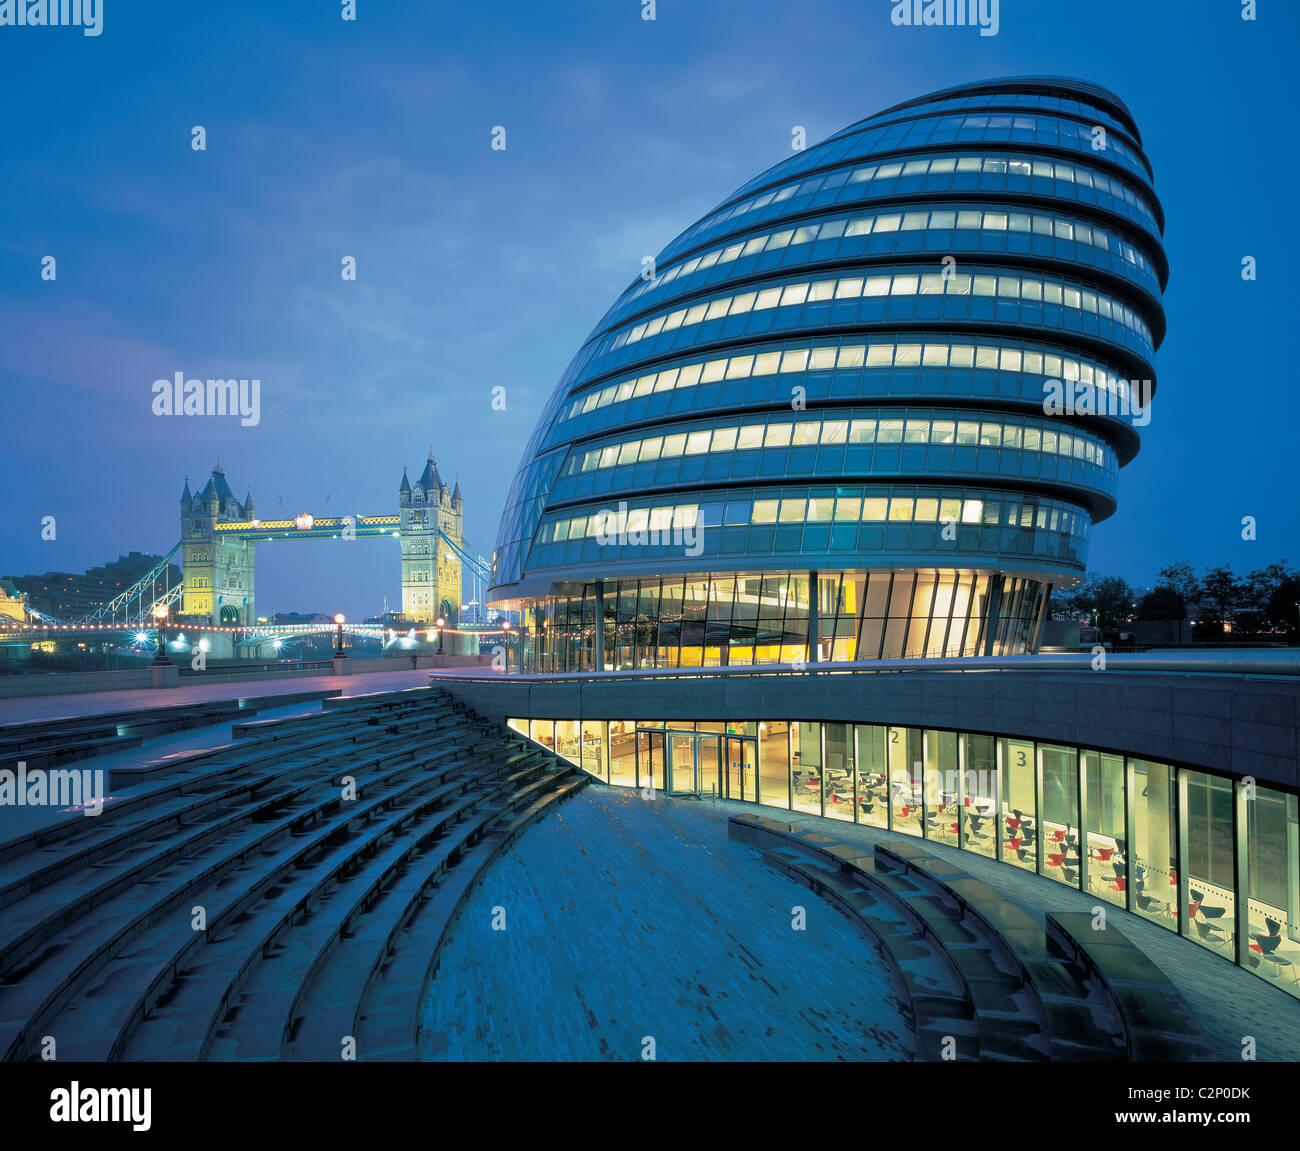 City Hall GLA, London. Daytime exterior 1999-2002 - Stock Image